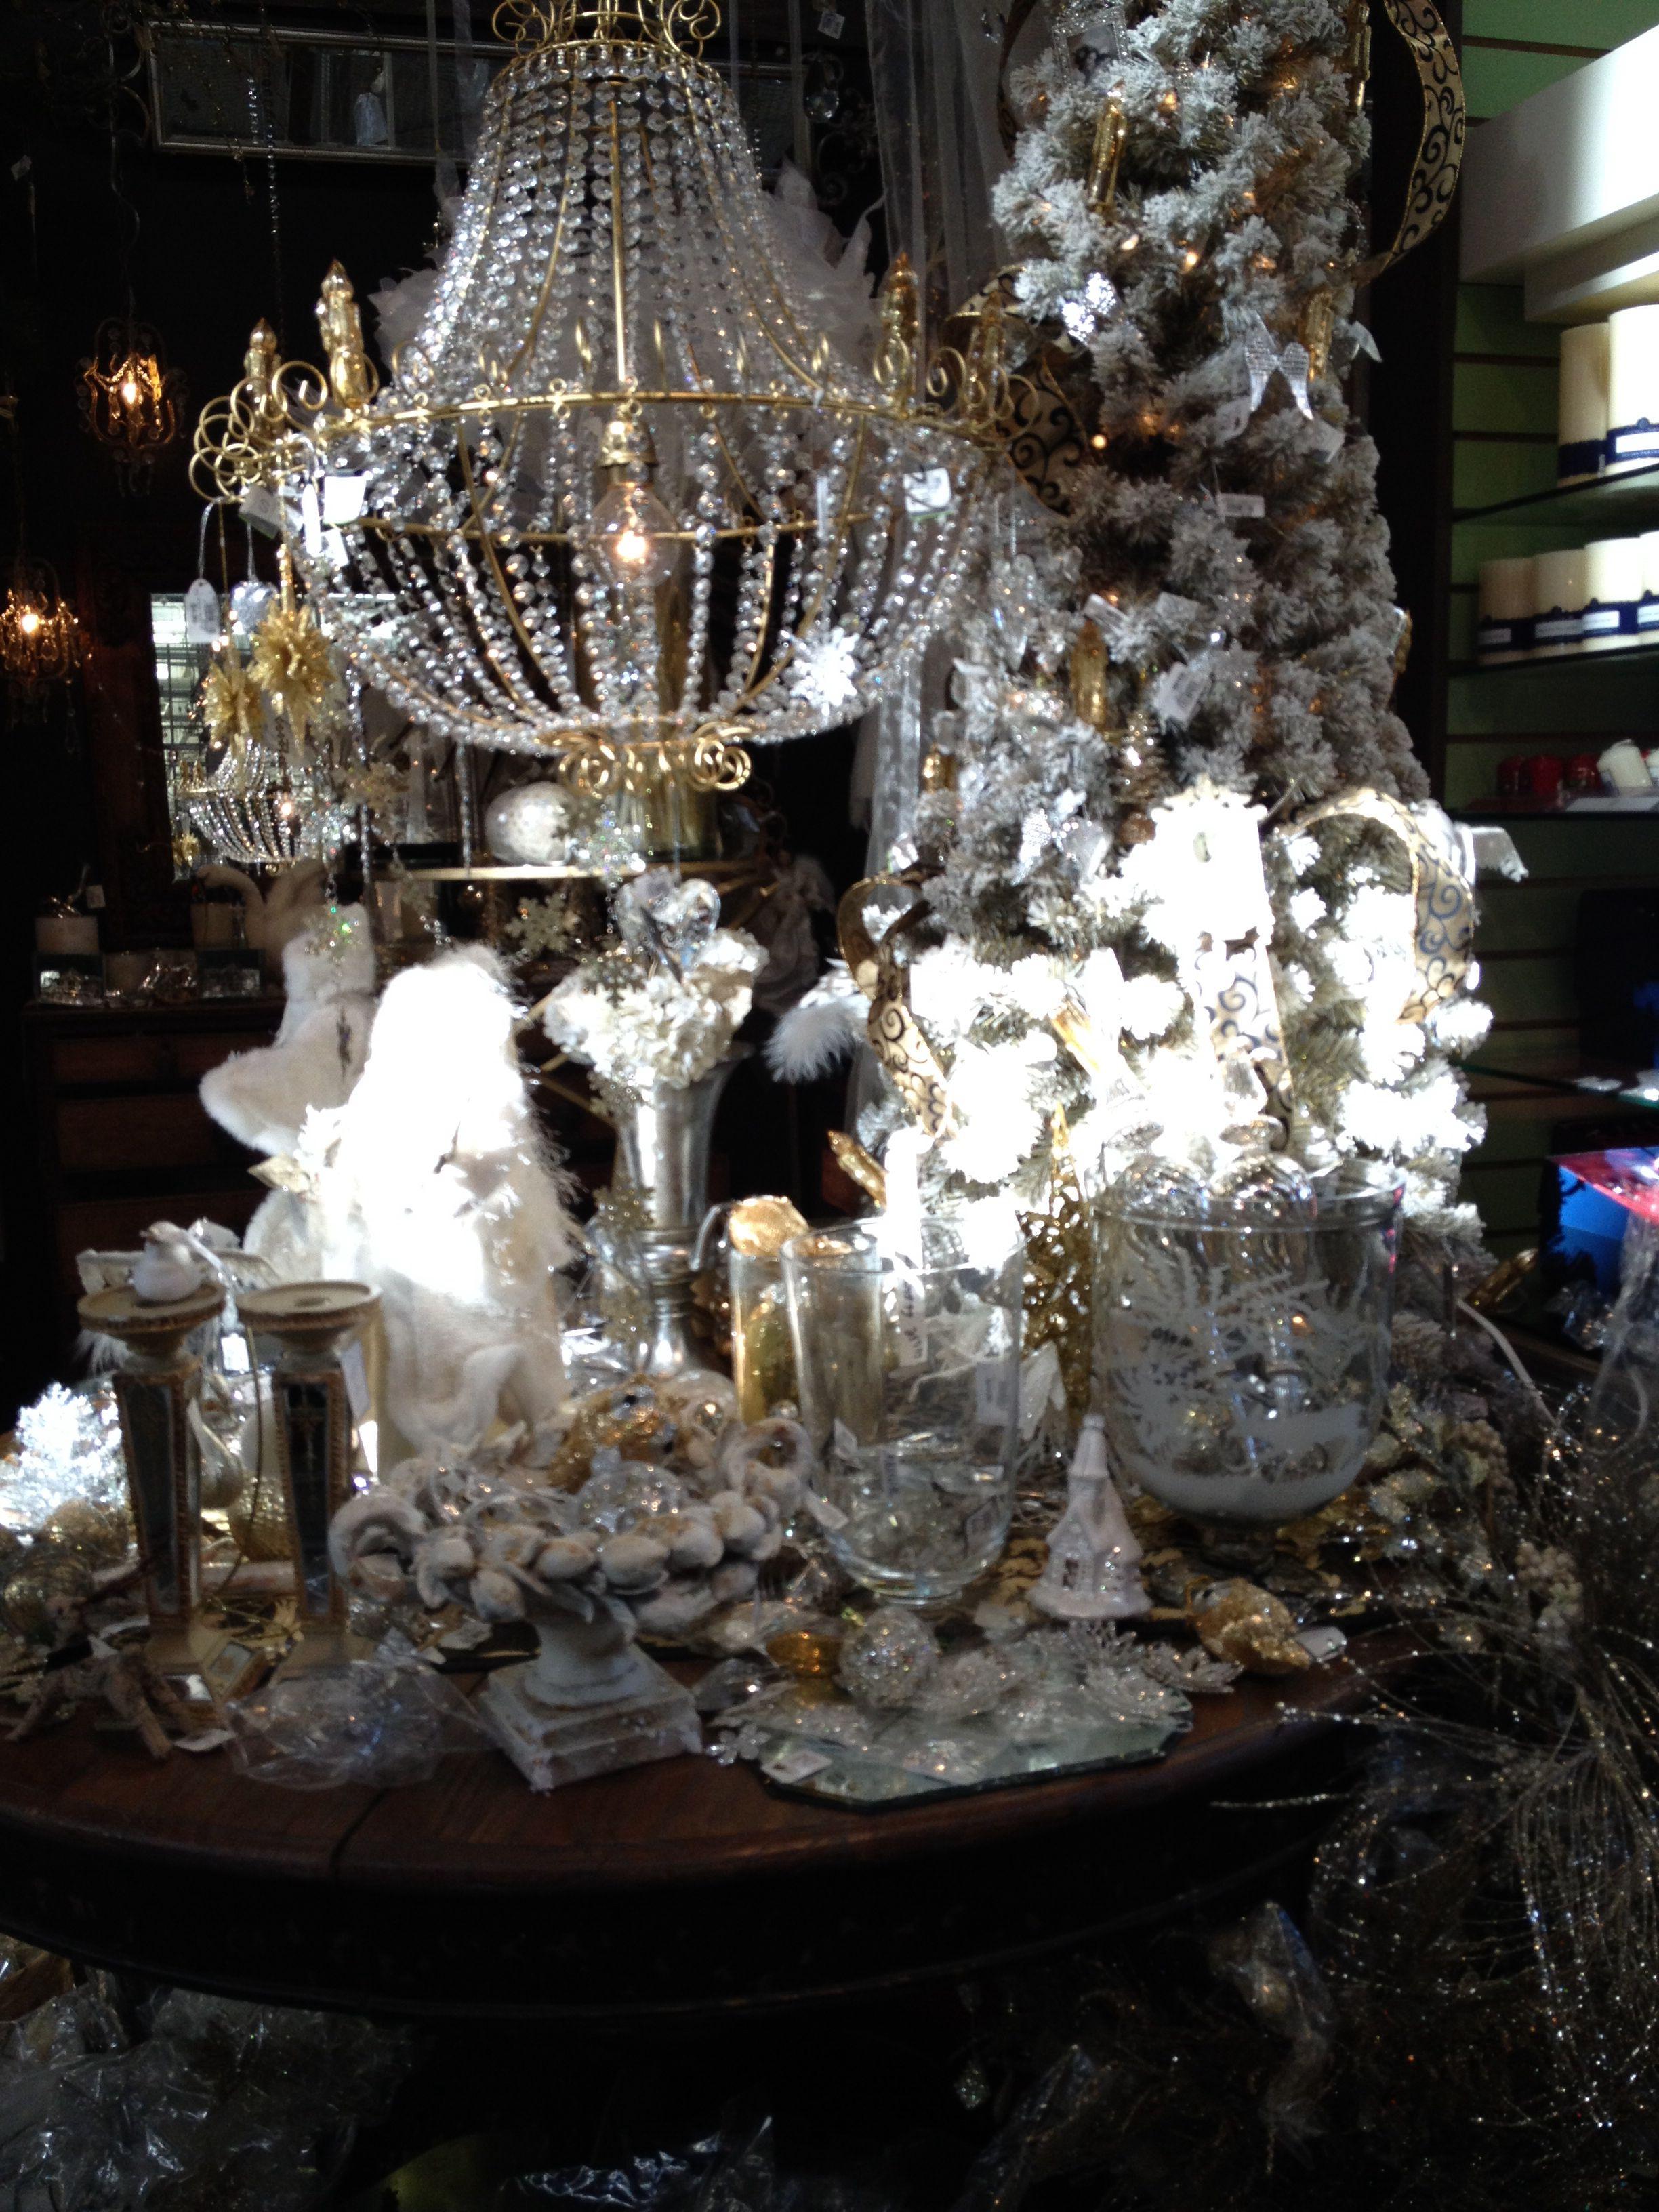 Christmas Decour From Merrifield Garden Center And Gainesville Virginia Live Gainesville